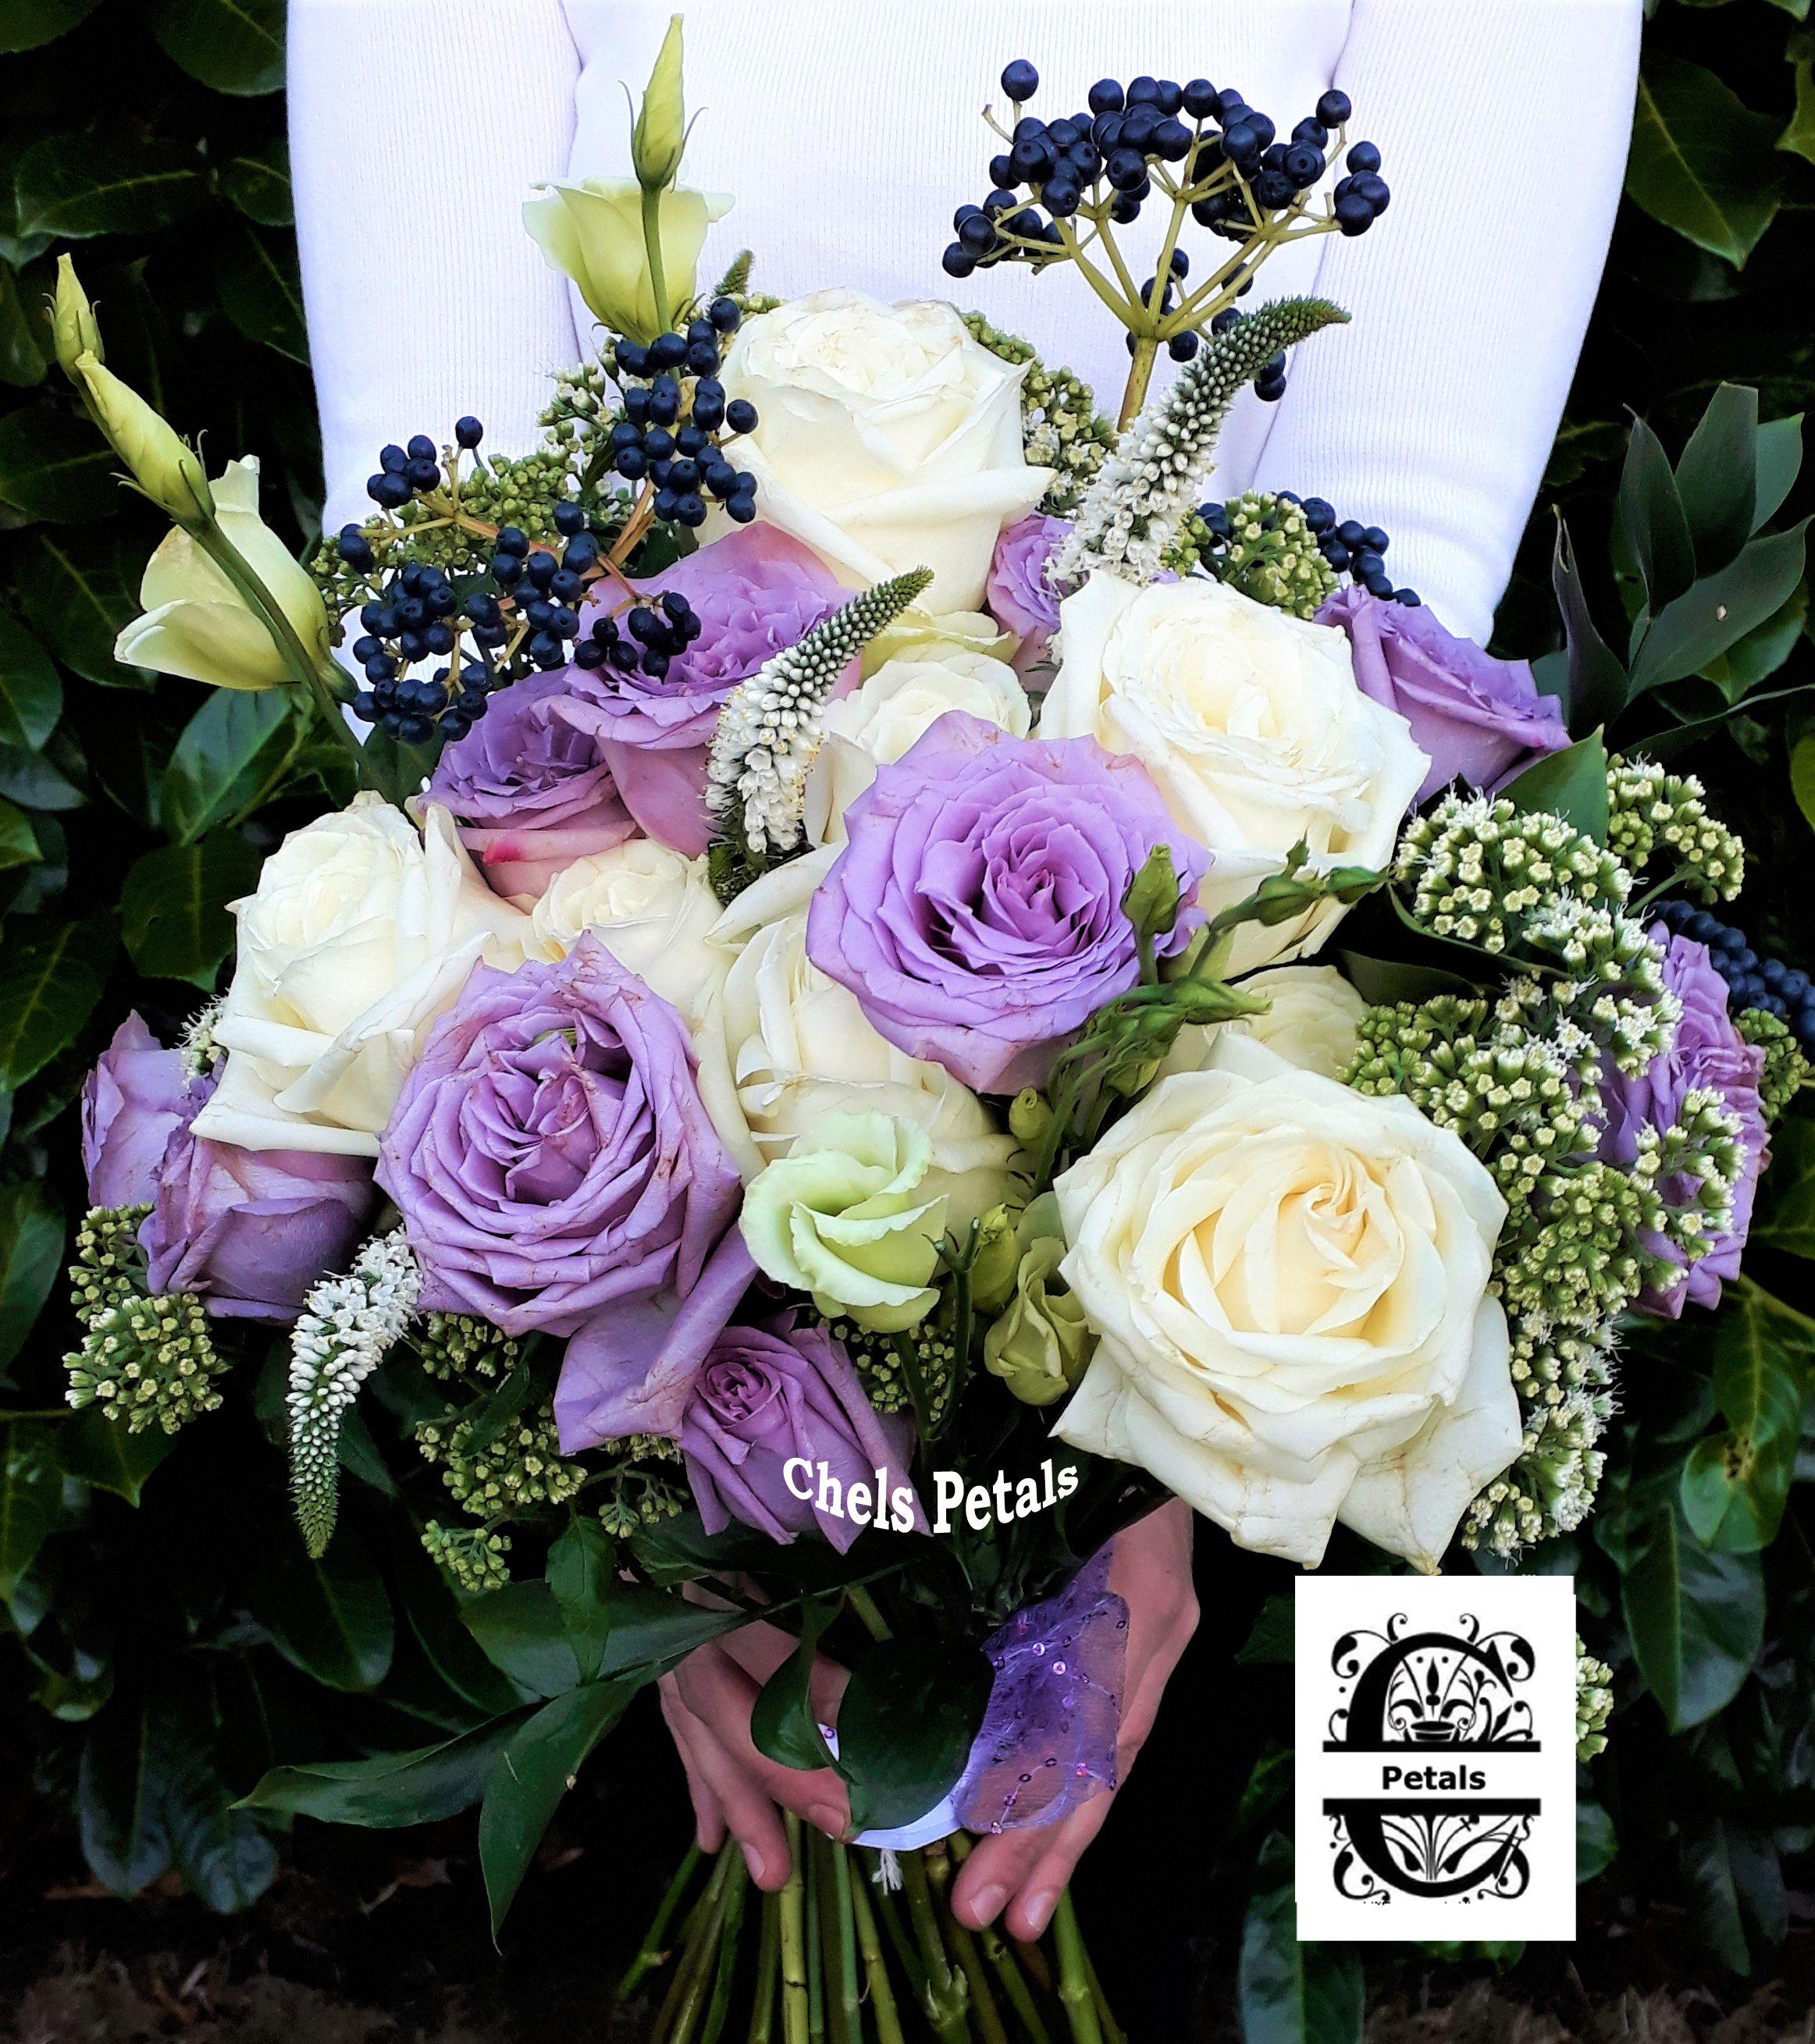 Chels Petals Wedding Bouquet Pink White Roses Wedding Petals Wedding Bouquet Pink White Wedding Bouquets Pink